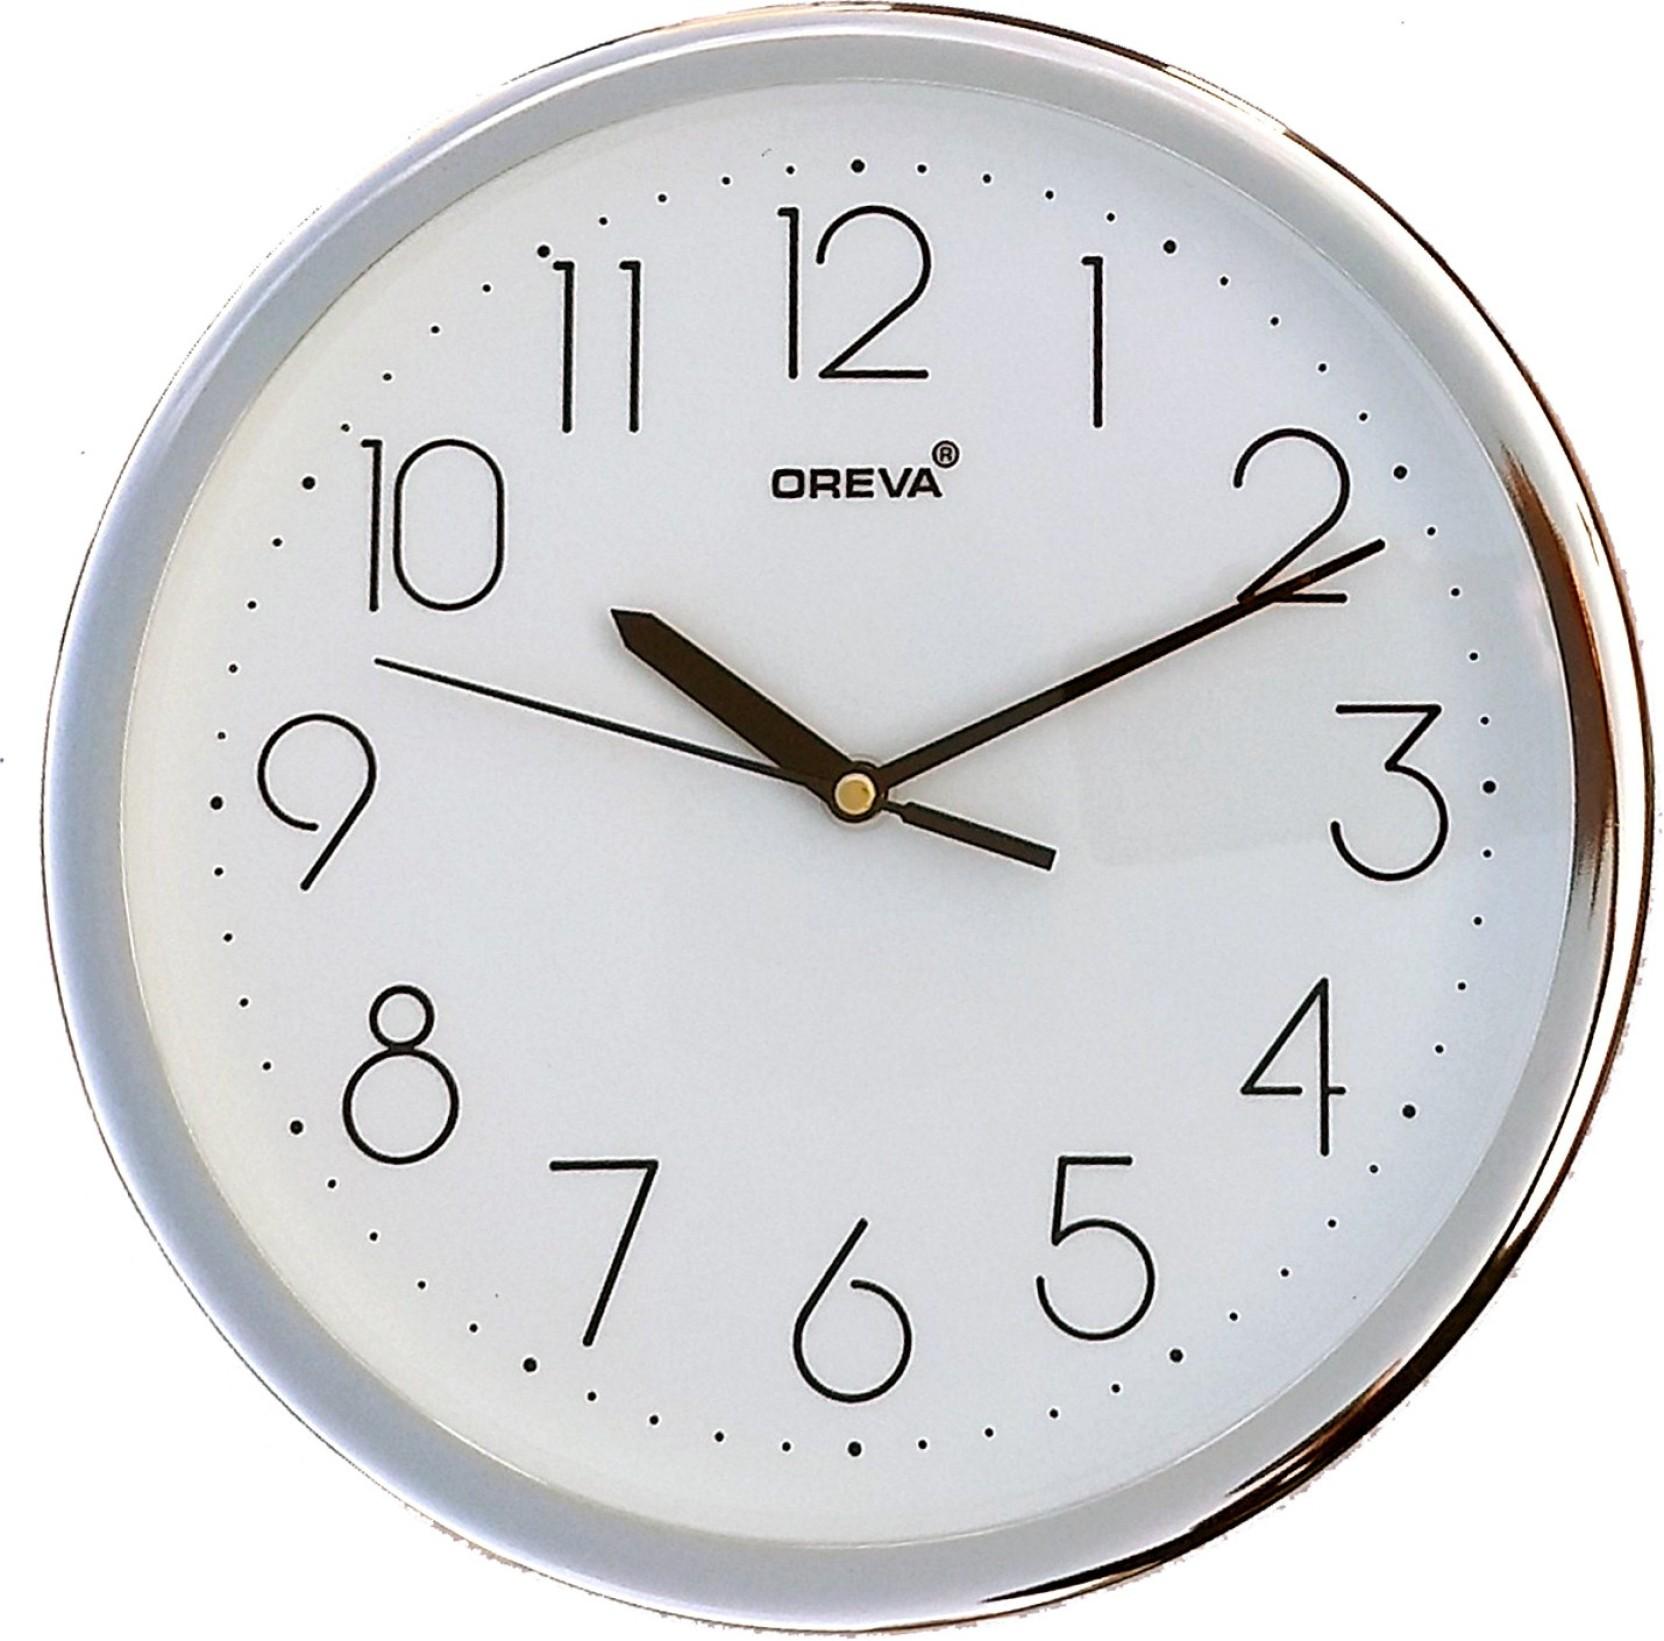 Ajanta oreva analog wall clock price in india buy ajanta oreva ajanta oreva analog wall clock add to cart amipublicfo Images